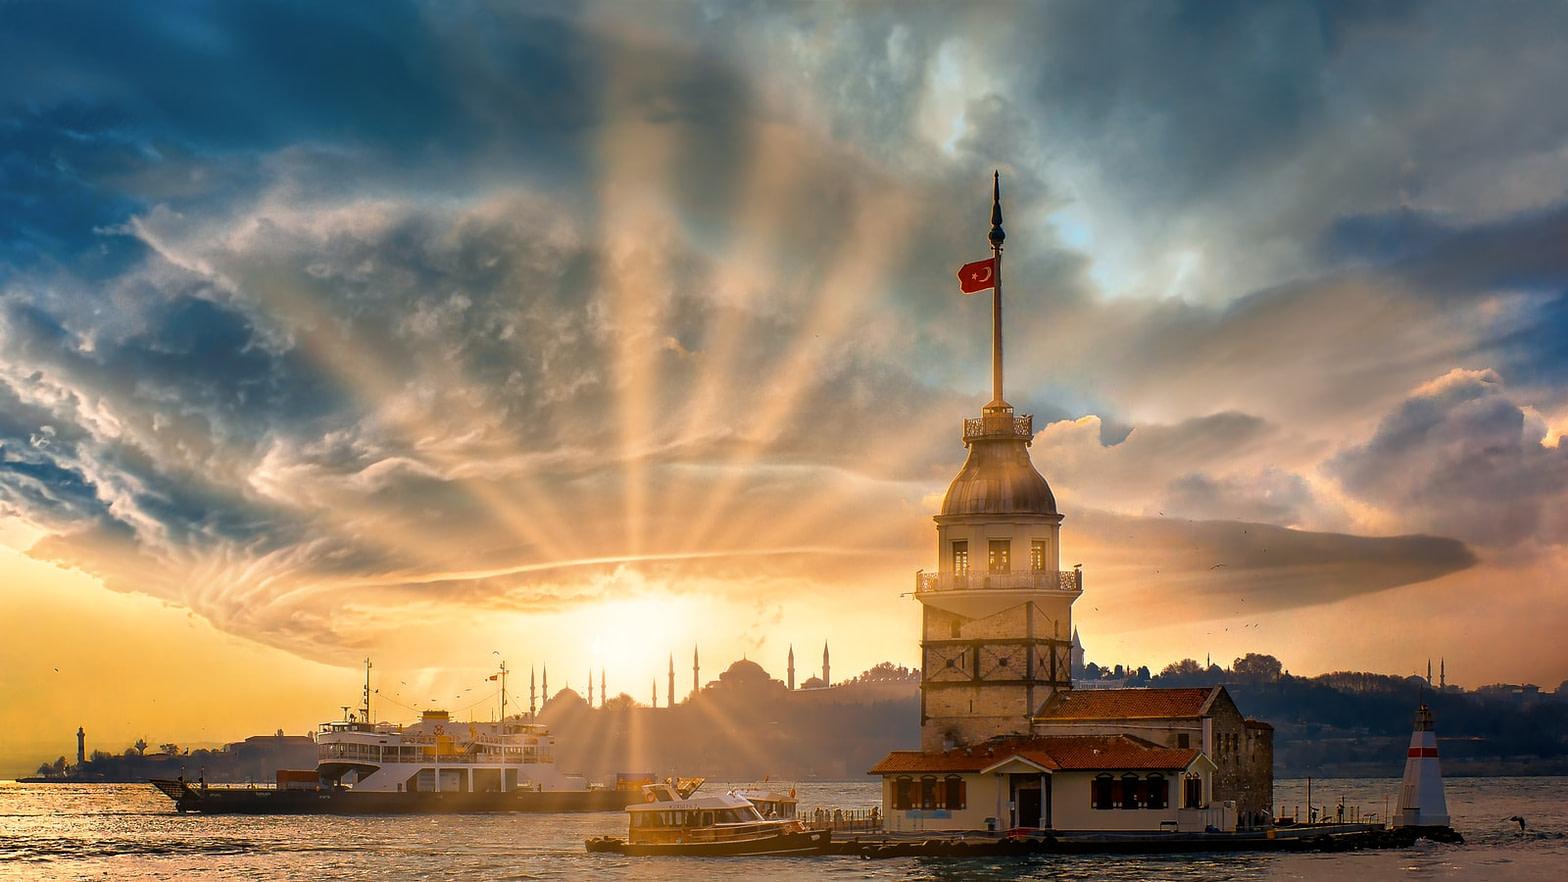 اسطنبول IST ISTANBUL